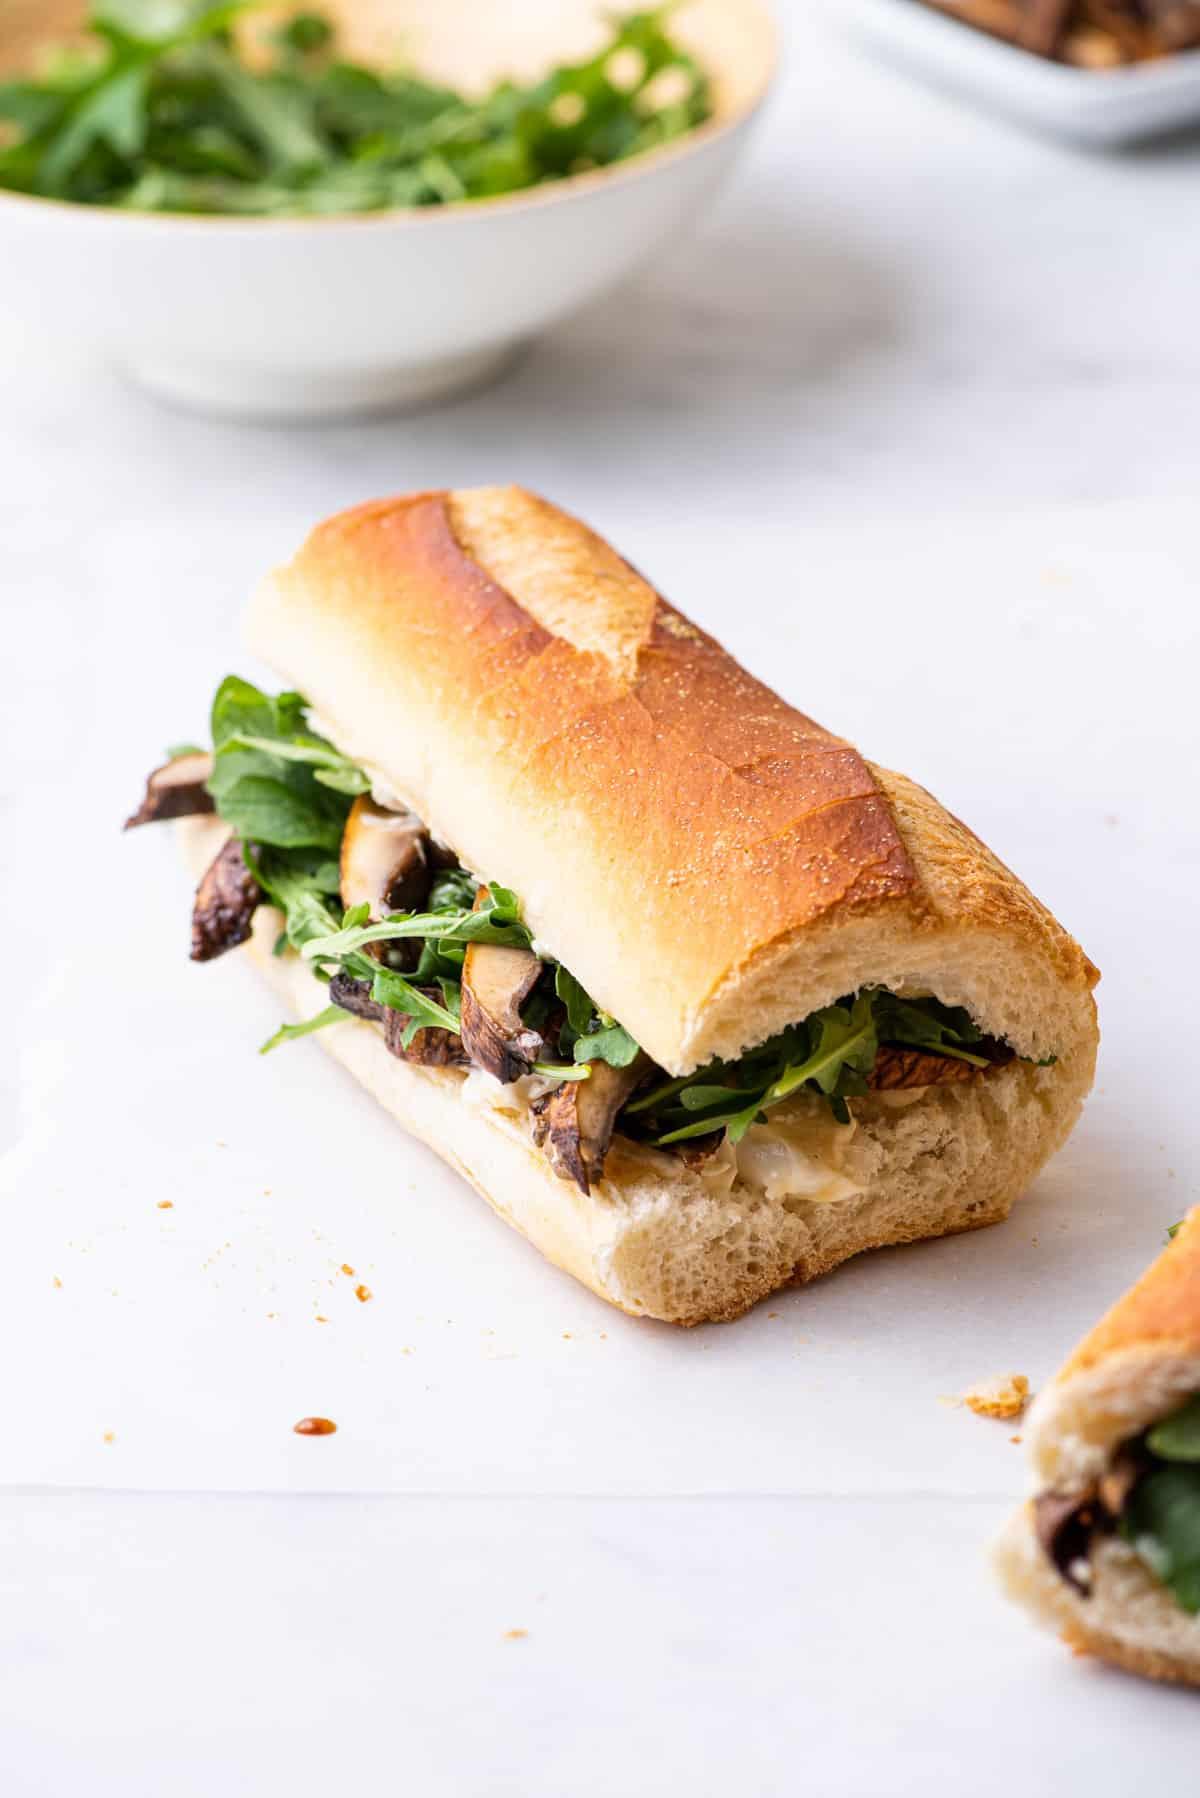 Vegan balsamic portobello sandwich on a baguette with arugula.